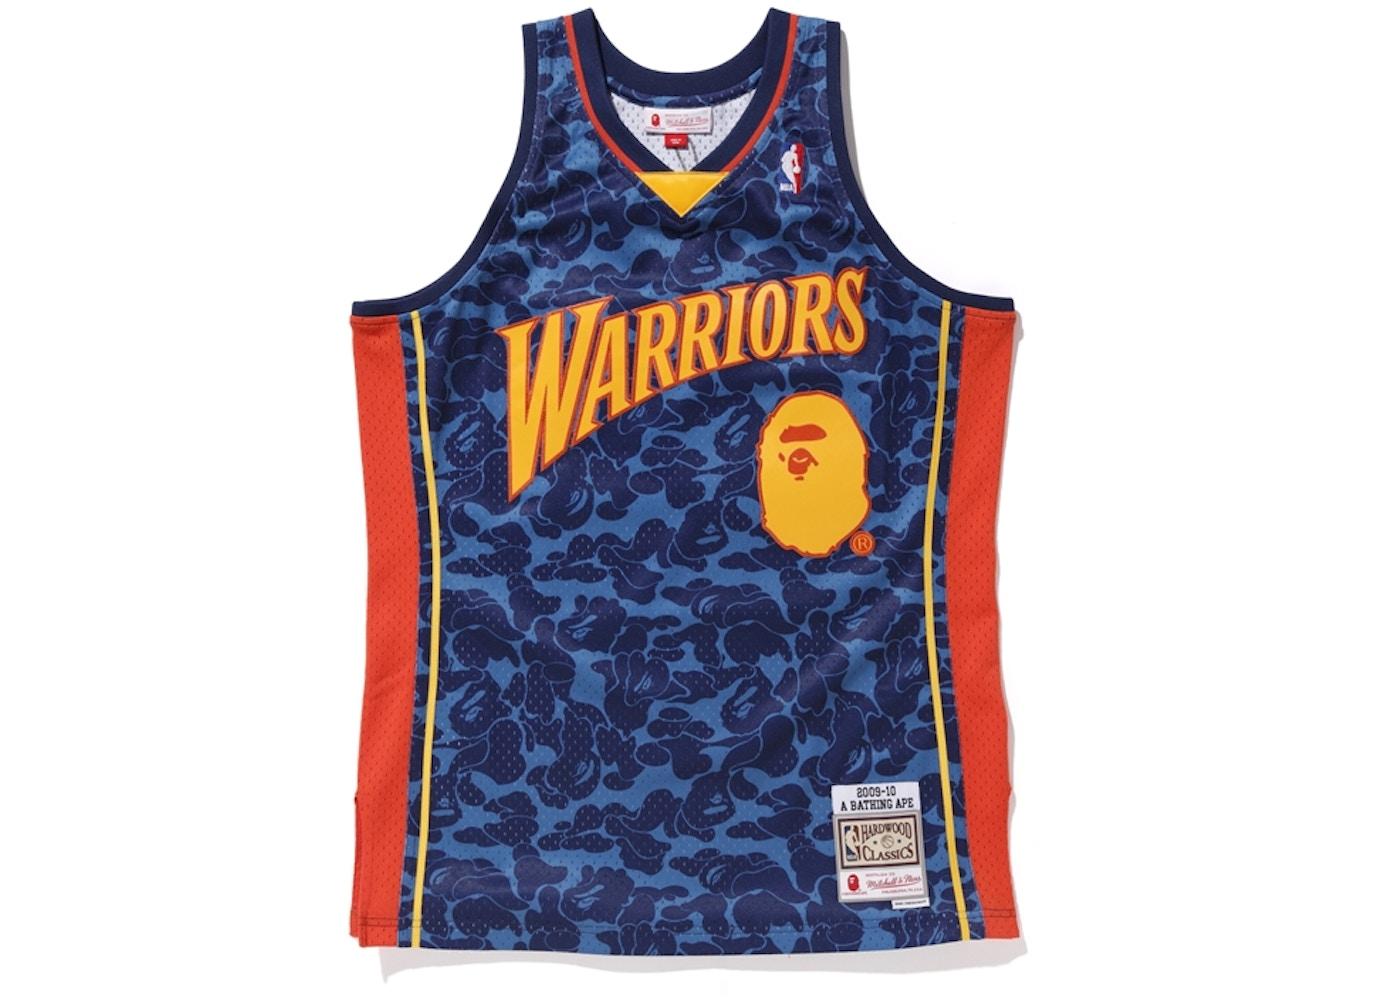 2c1a1a98d1c Streetwear - Bape Tops/Sweatshirts - Price Premium